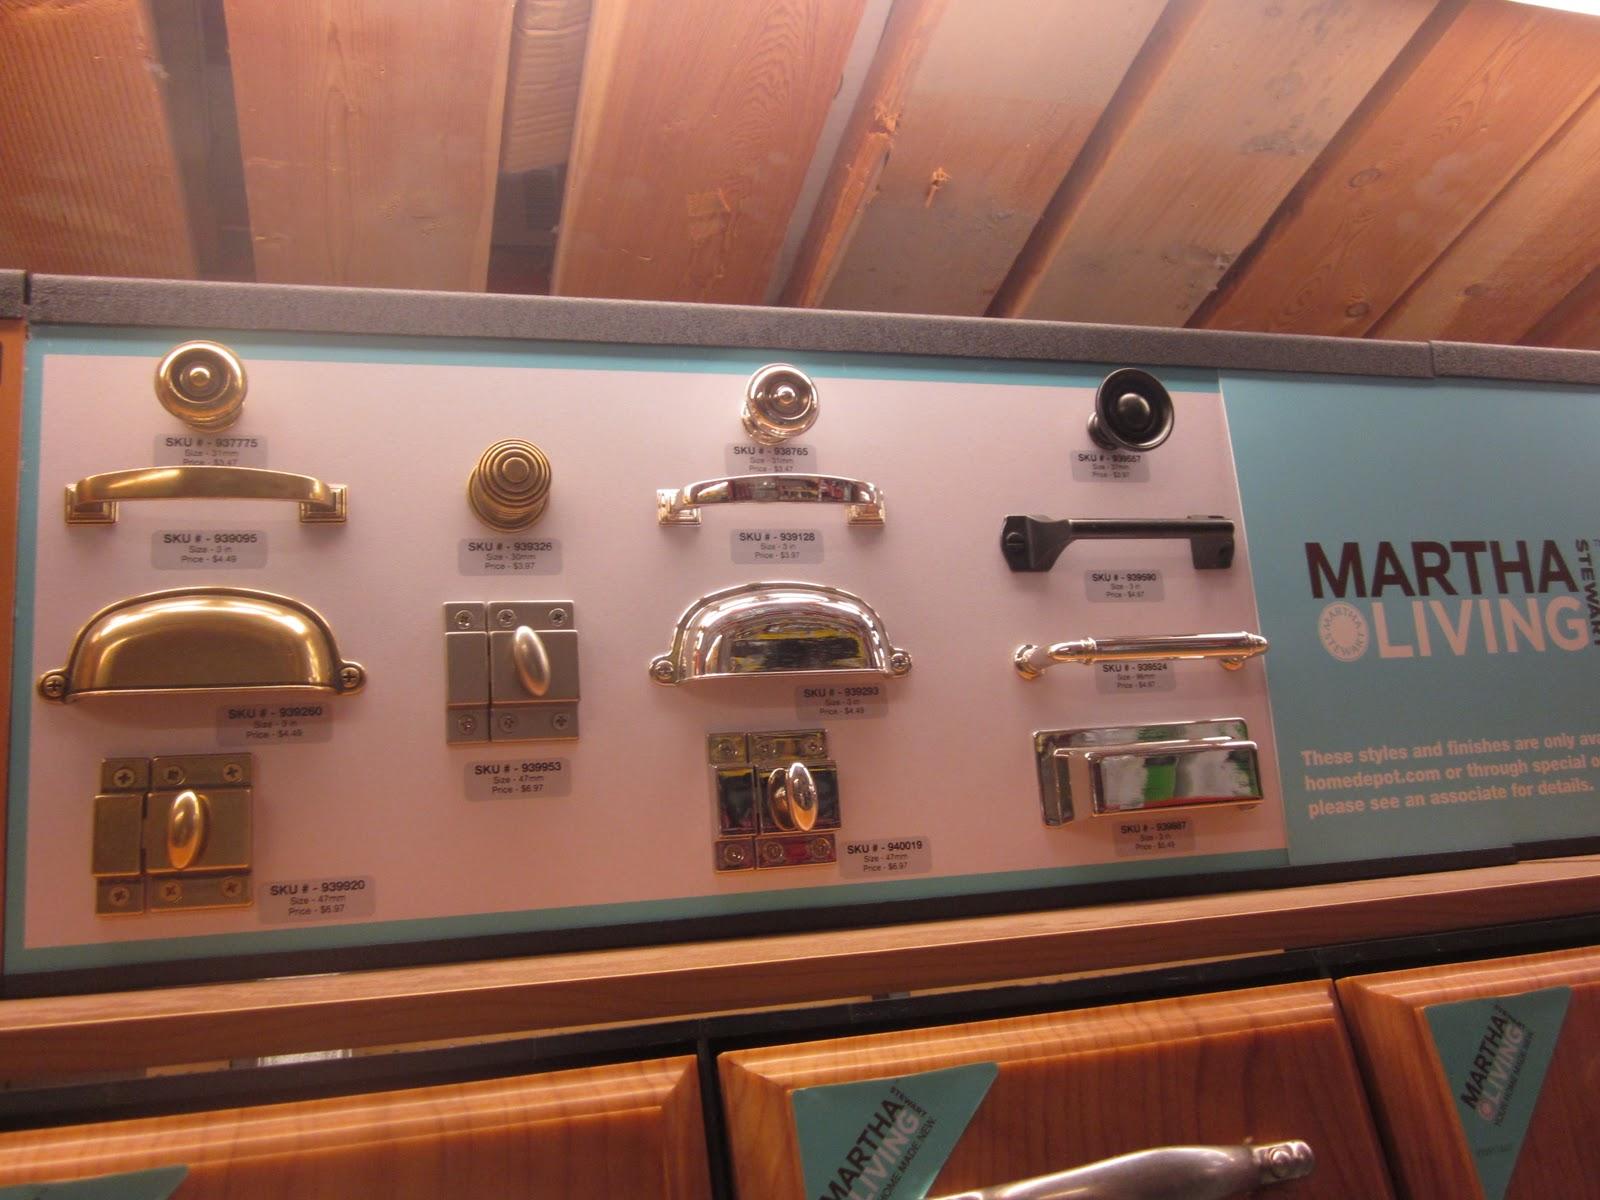 Picket Fence Design: Martha Stewart Hardware - A Good Thing